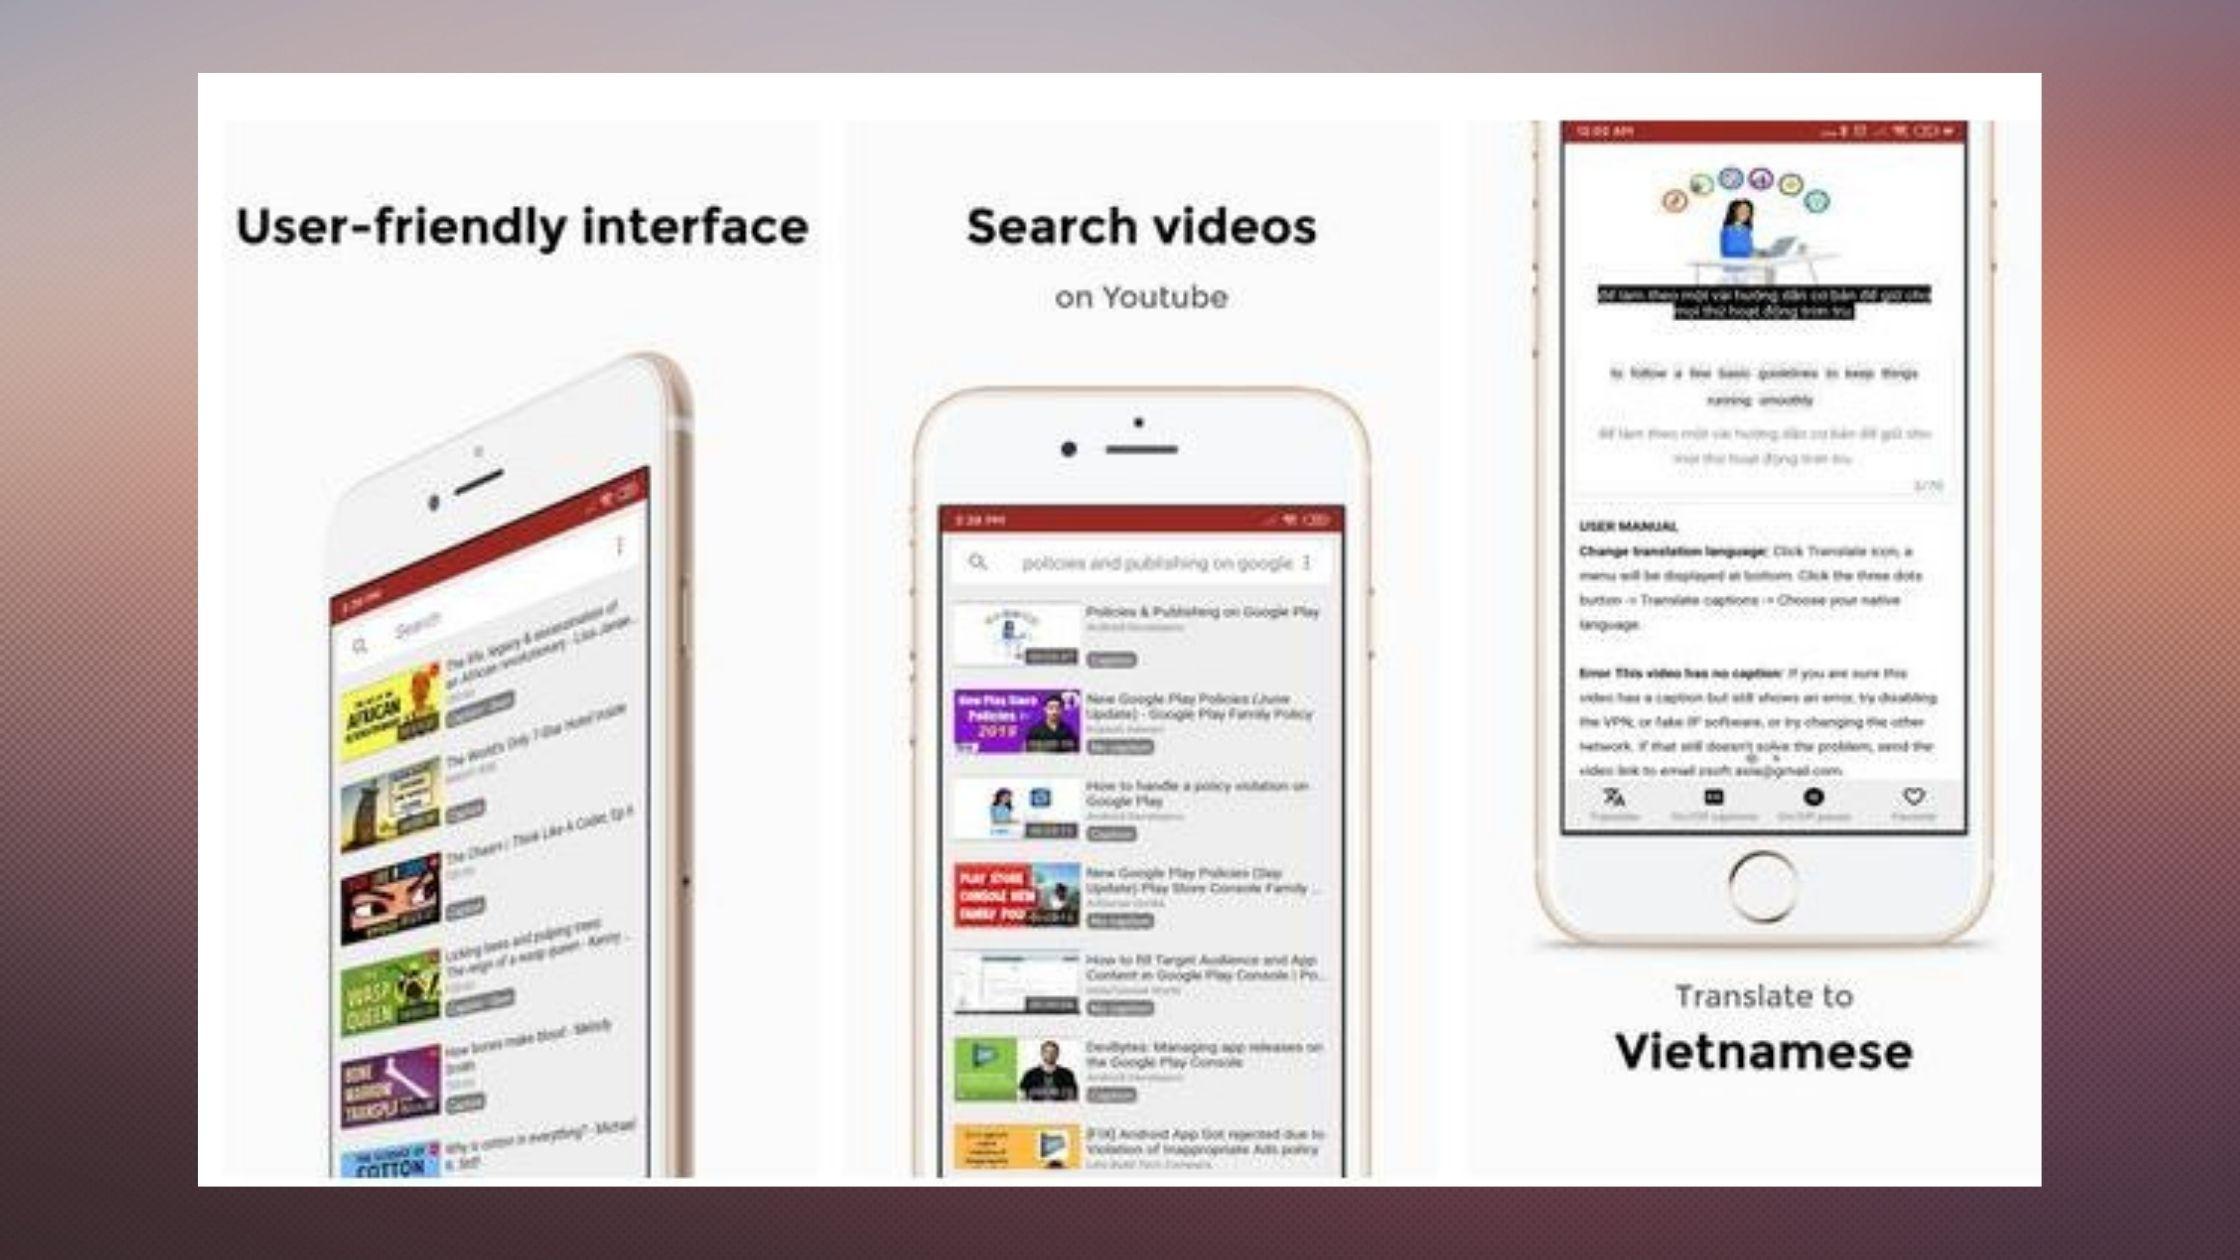 Subtranslate Apk Aplikasi Otomatis Translate Subtitle Video Youtube Bijak Youtube Video